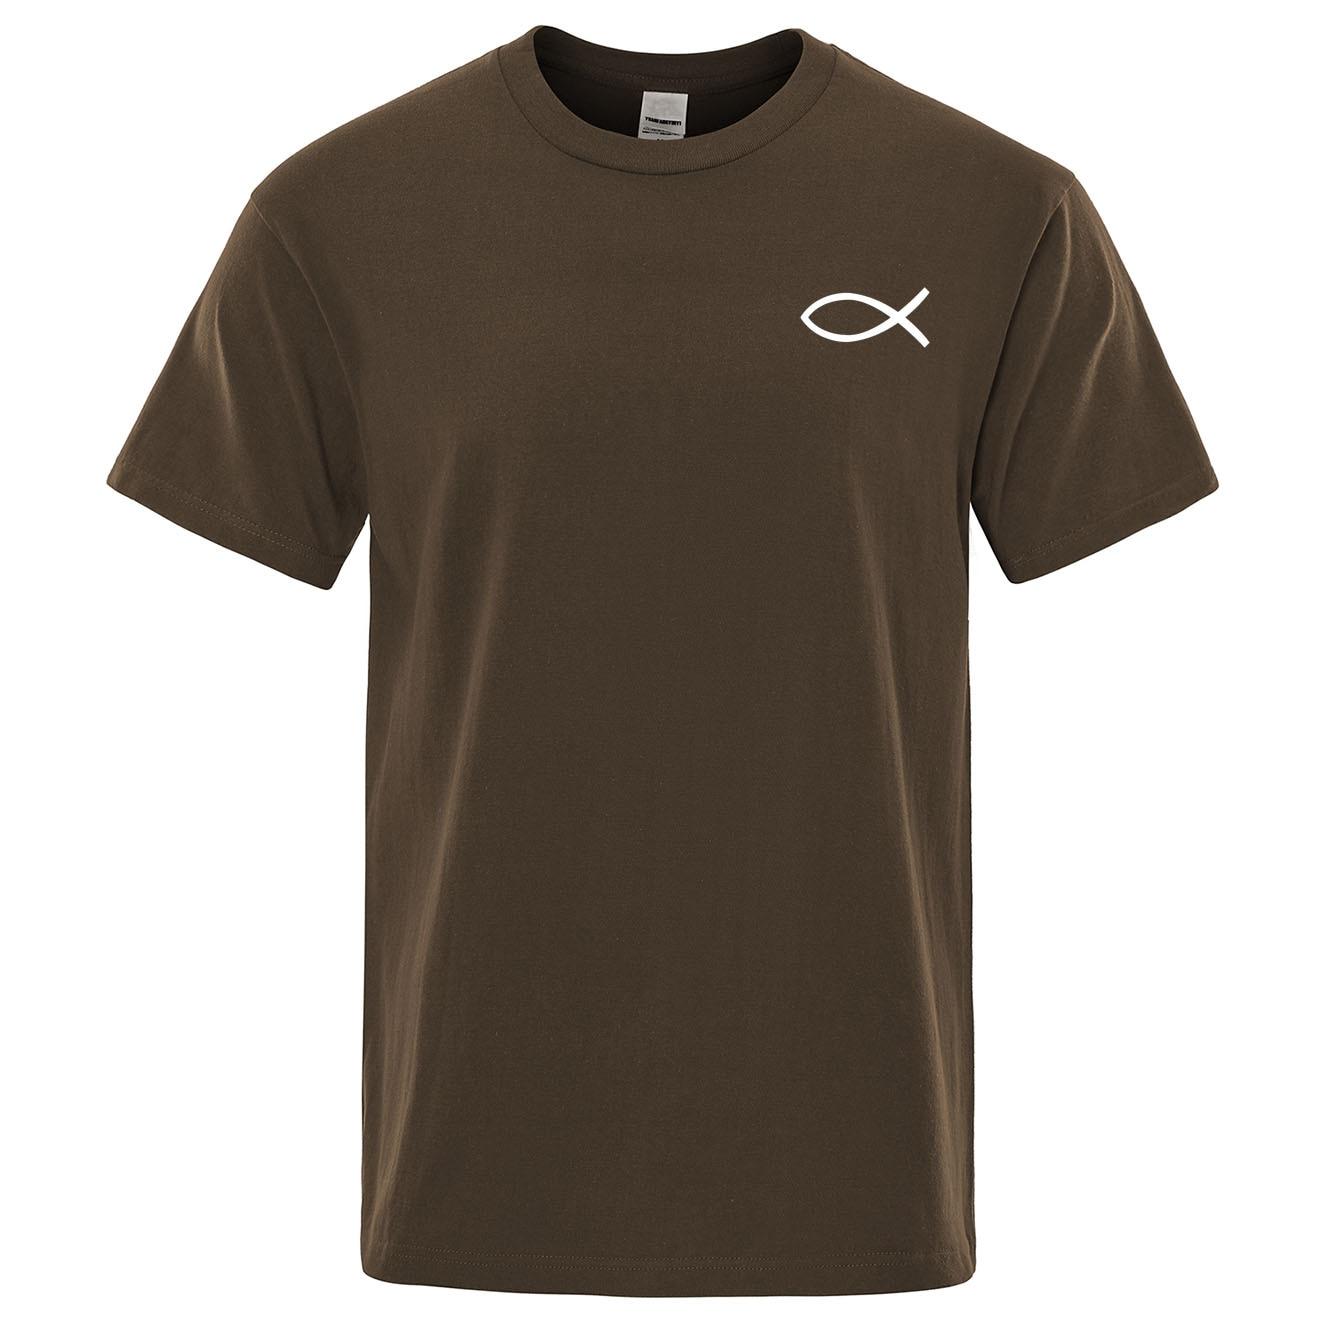 2019 Summer New T Shirt Mens Brand Tees Boys Male T-Shirt Short Sleeve Tops Christian JESUS Fish High Quality Cotton Men Tshirt